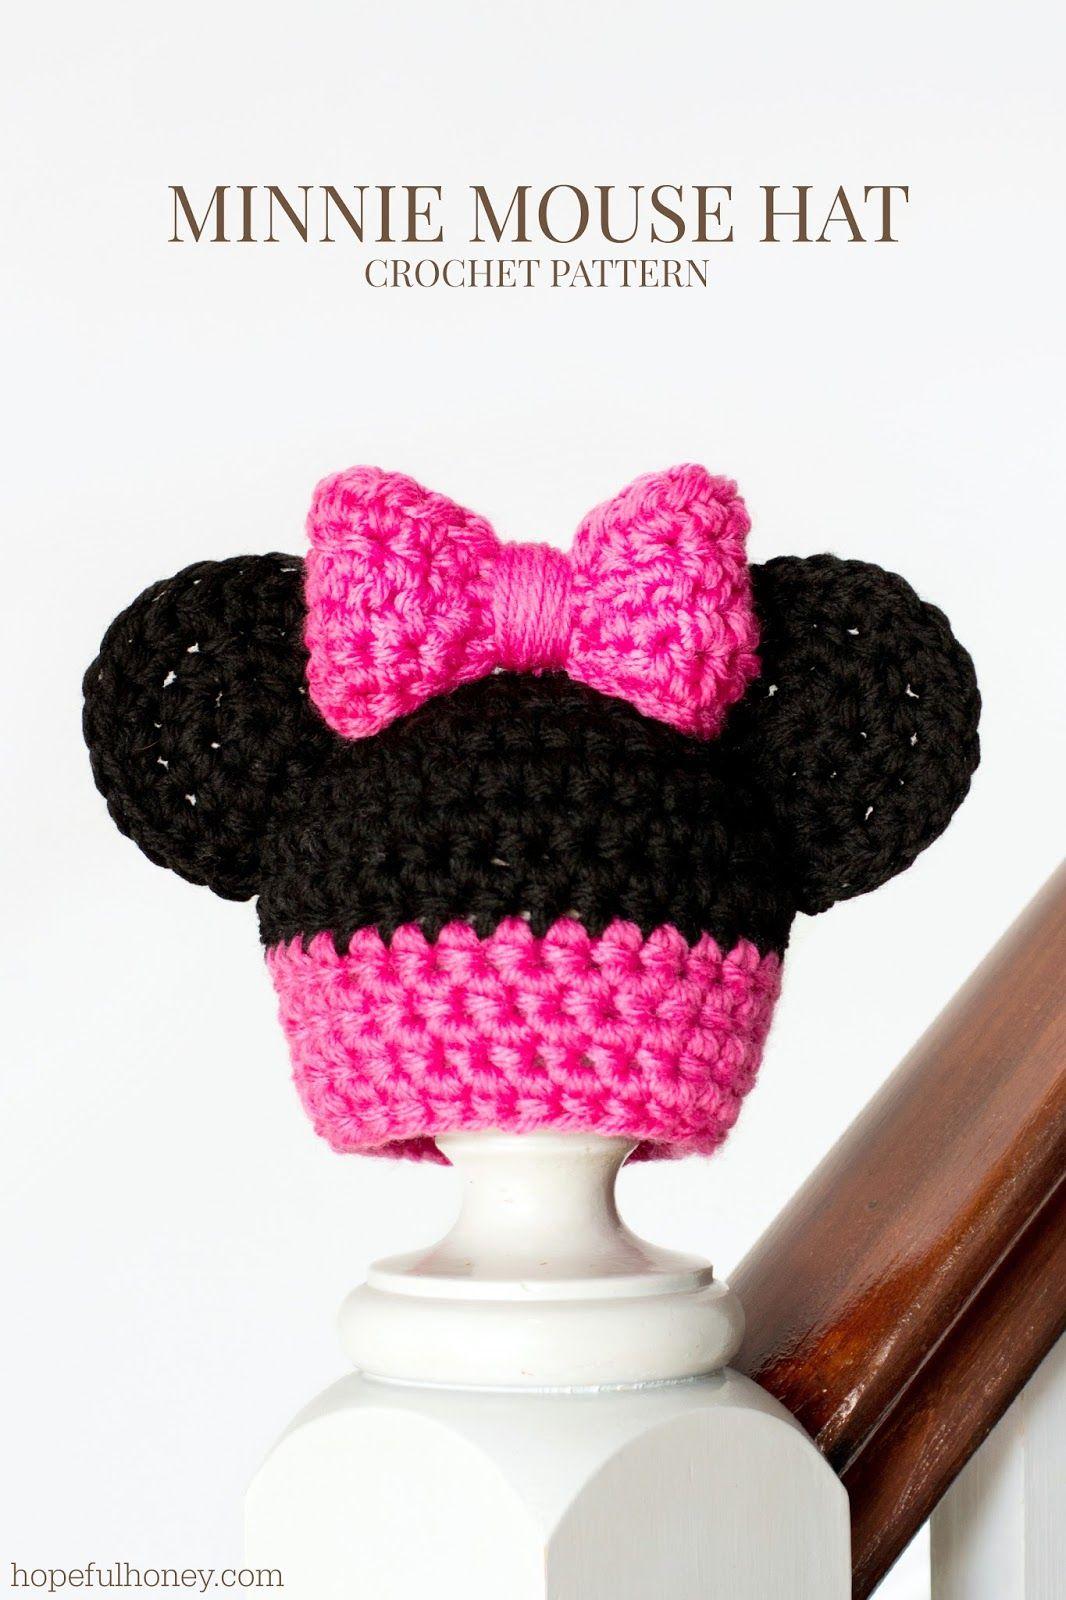 Newborn Minnie Mouse Inspired Hat Crochet Pattern | Hopeful honey ...